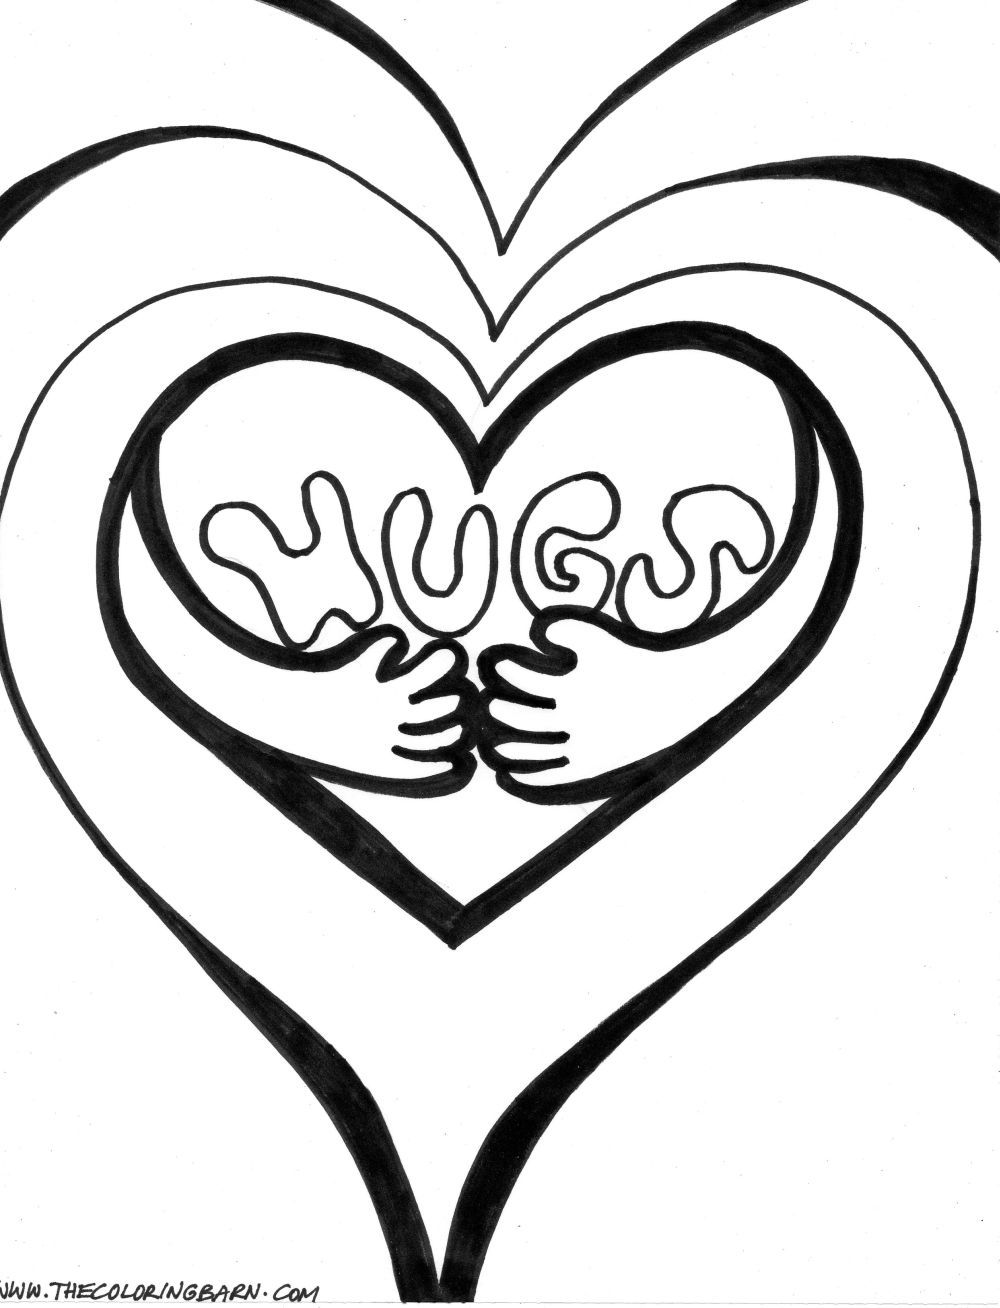 Un Bonito Dibujo De Un Corazon Formando Un Abrazo De Amor Abrazos De Amor Dibujos Dibujos De Abrazos